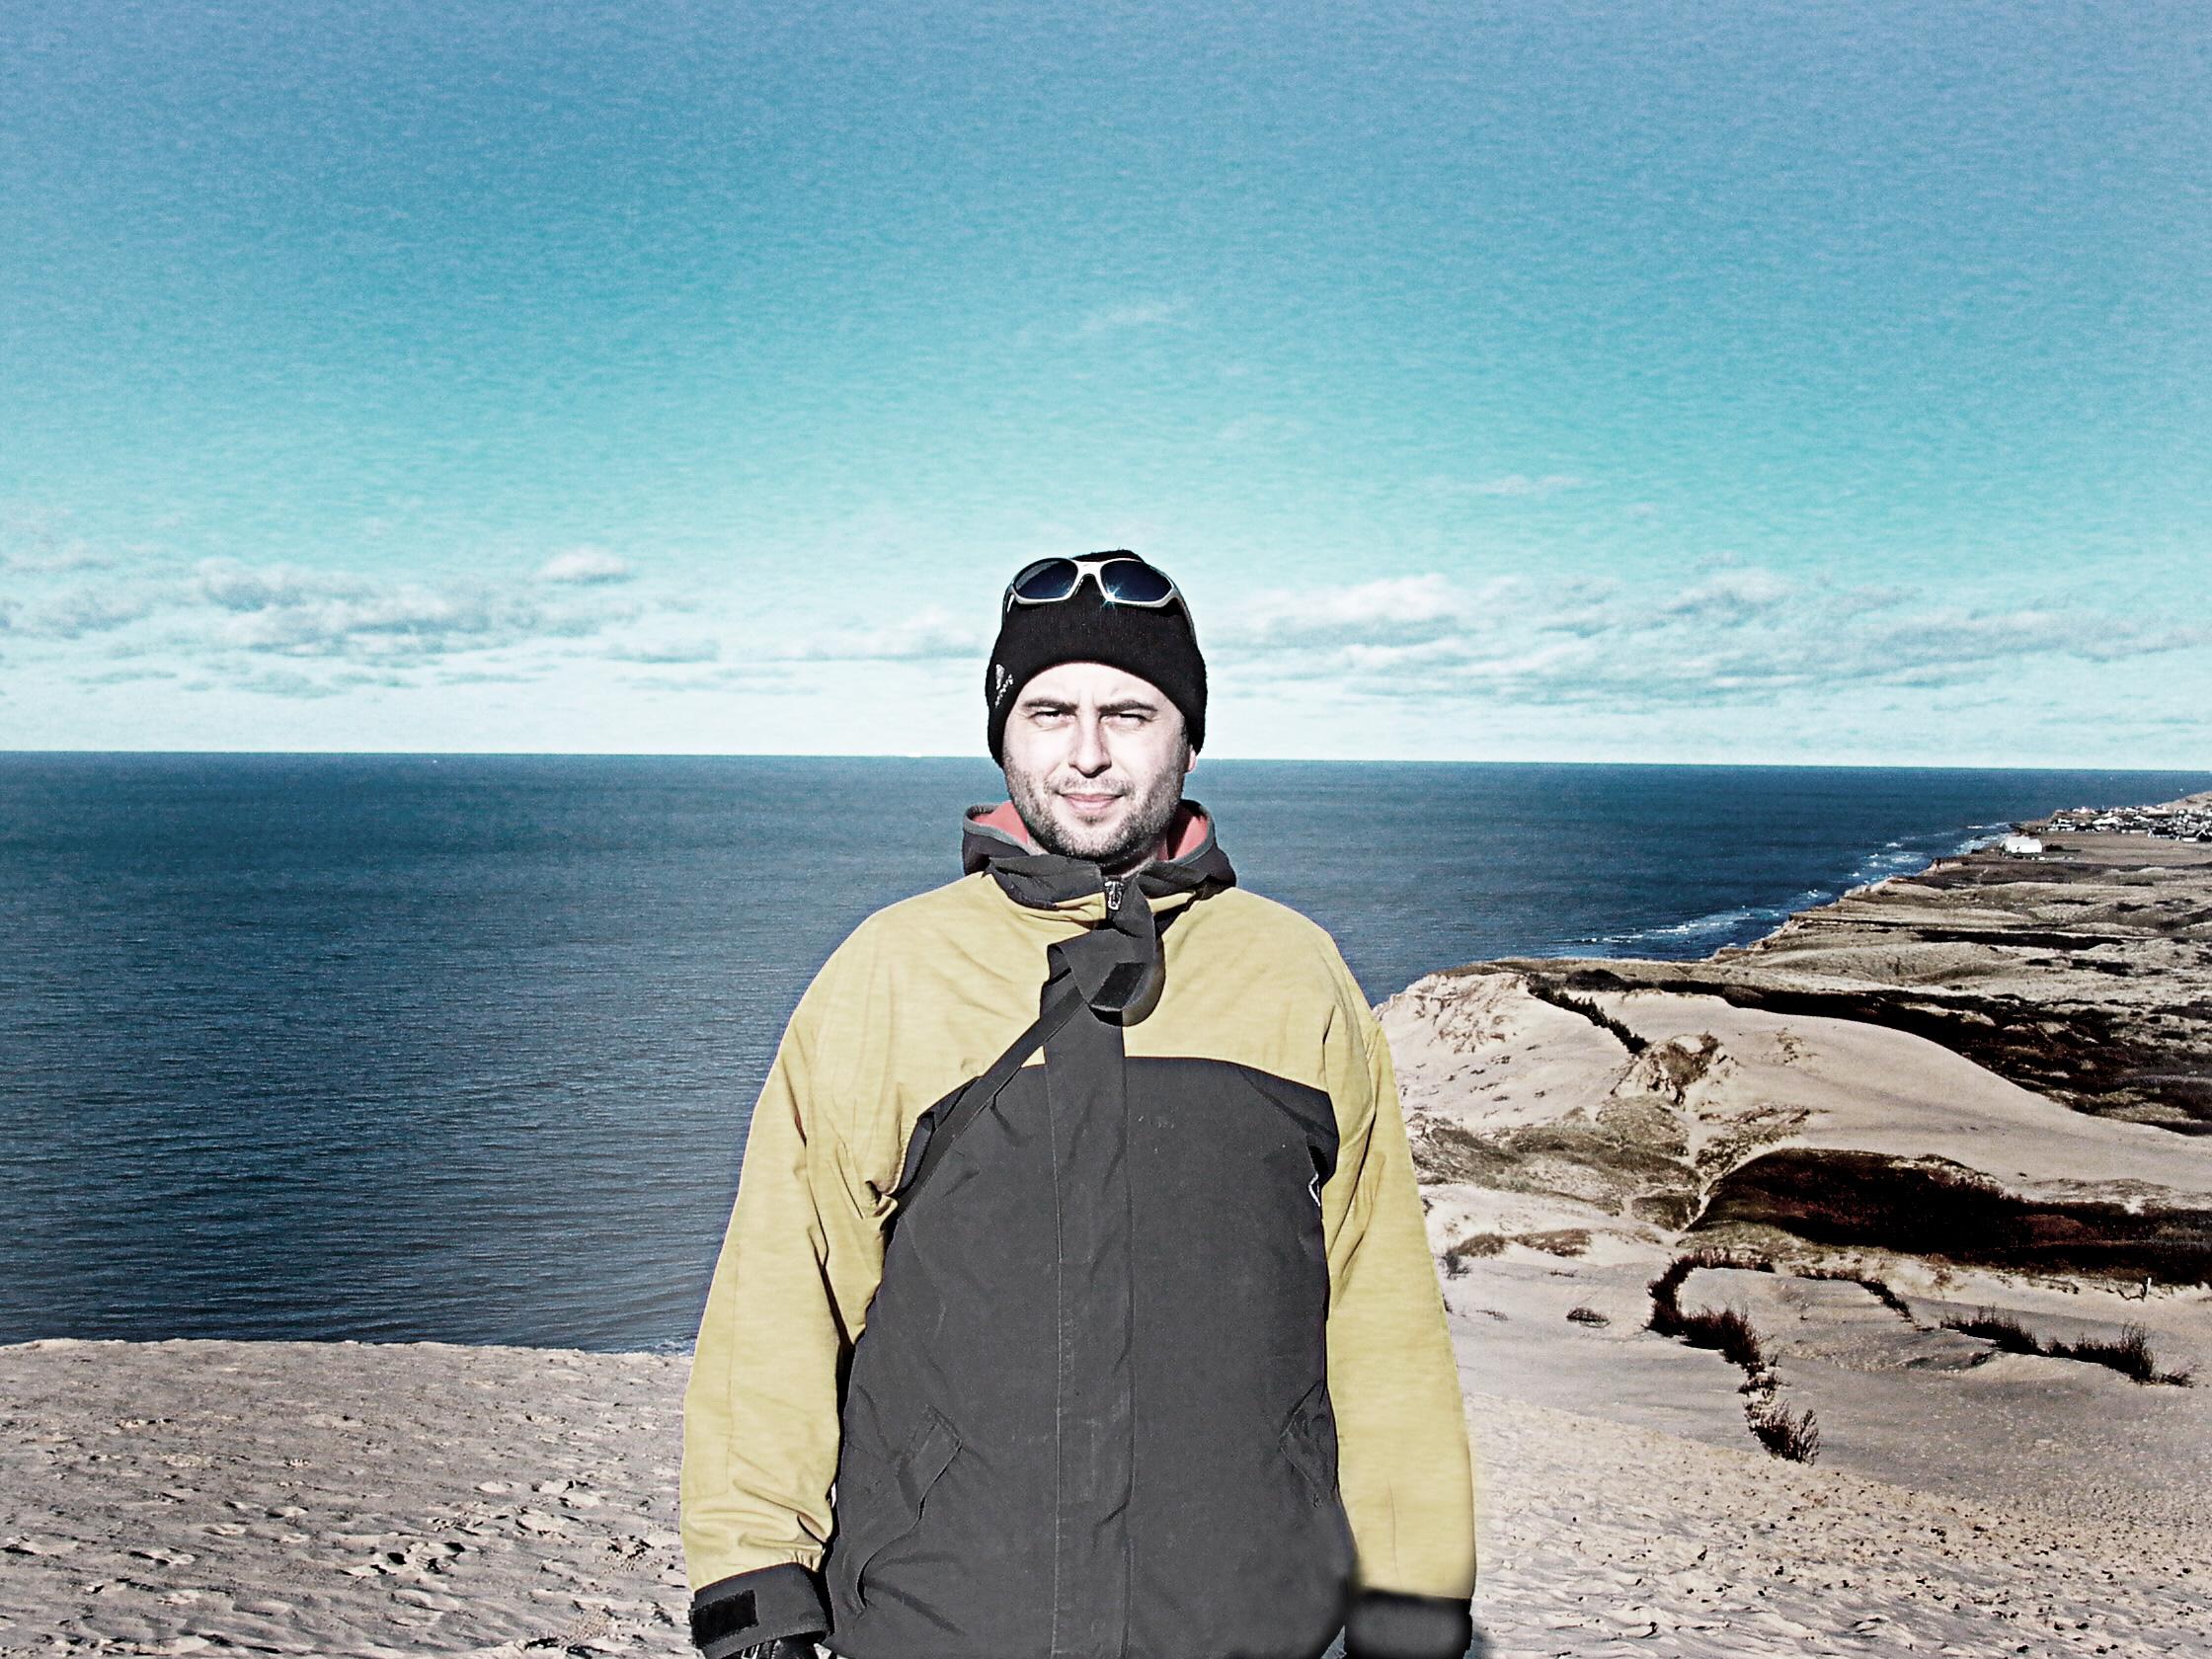 Casper Sølberg (født 1970) er en dansk billedkunstner, designer og surfer. Han startede Vraggods-serien i 2006 efter ca. 20 år som surfer langs Vesterhavet.